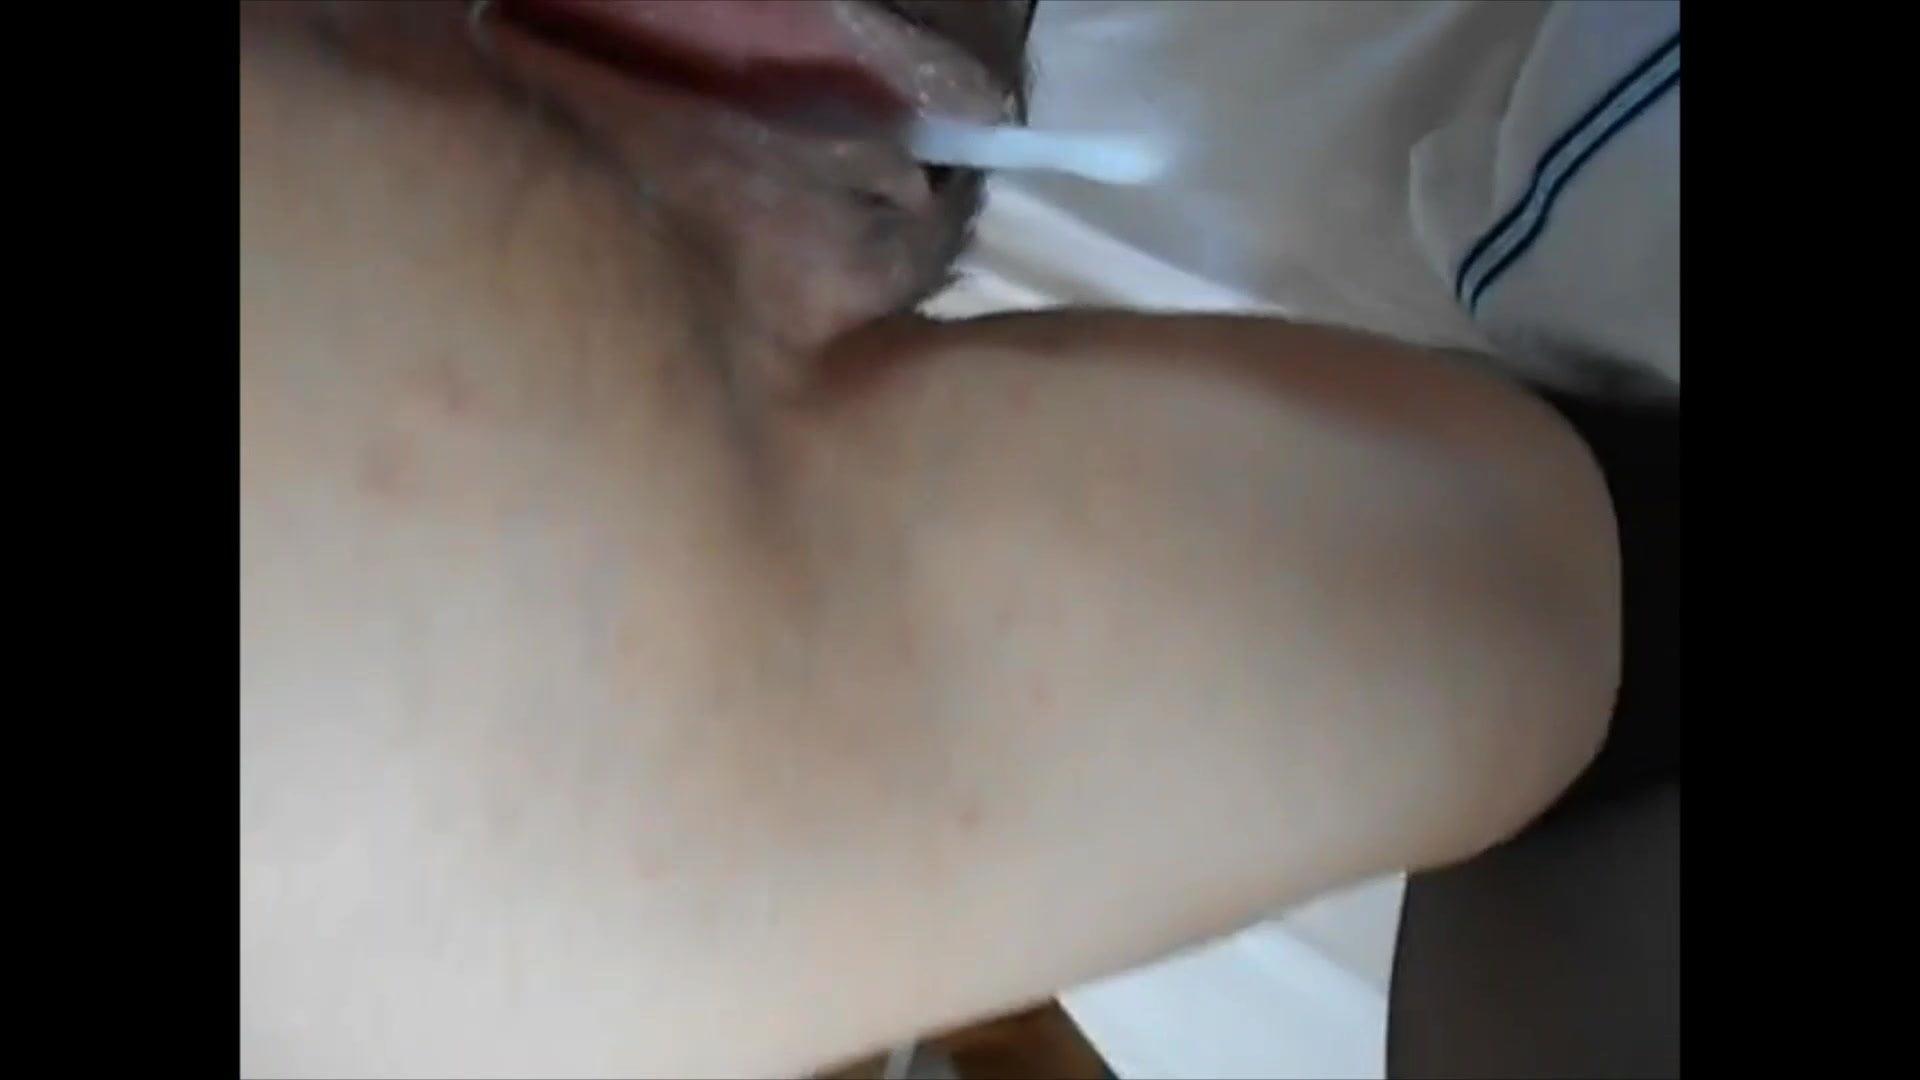 Big Tit French Lesbian Maid